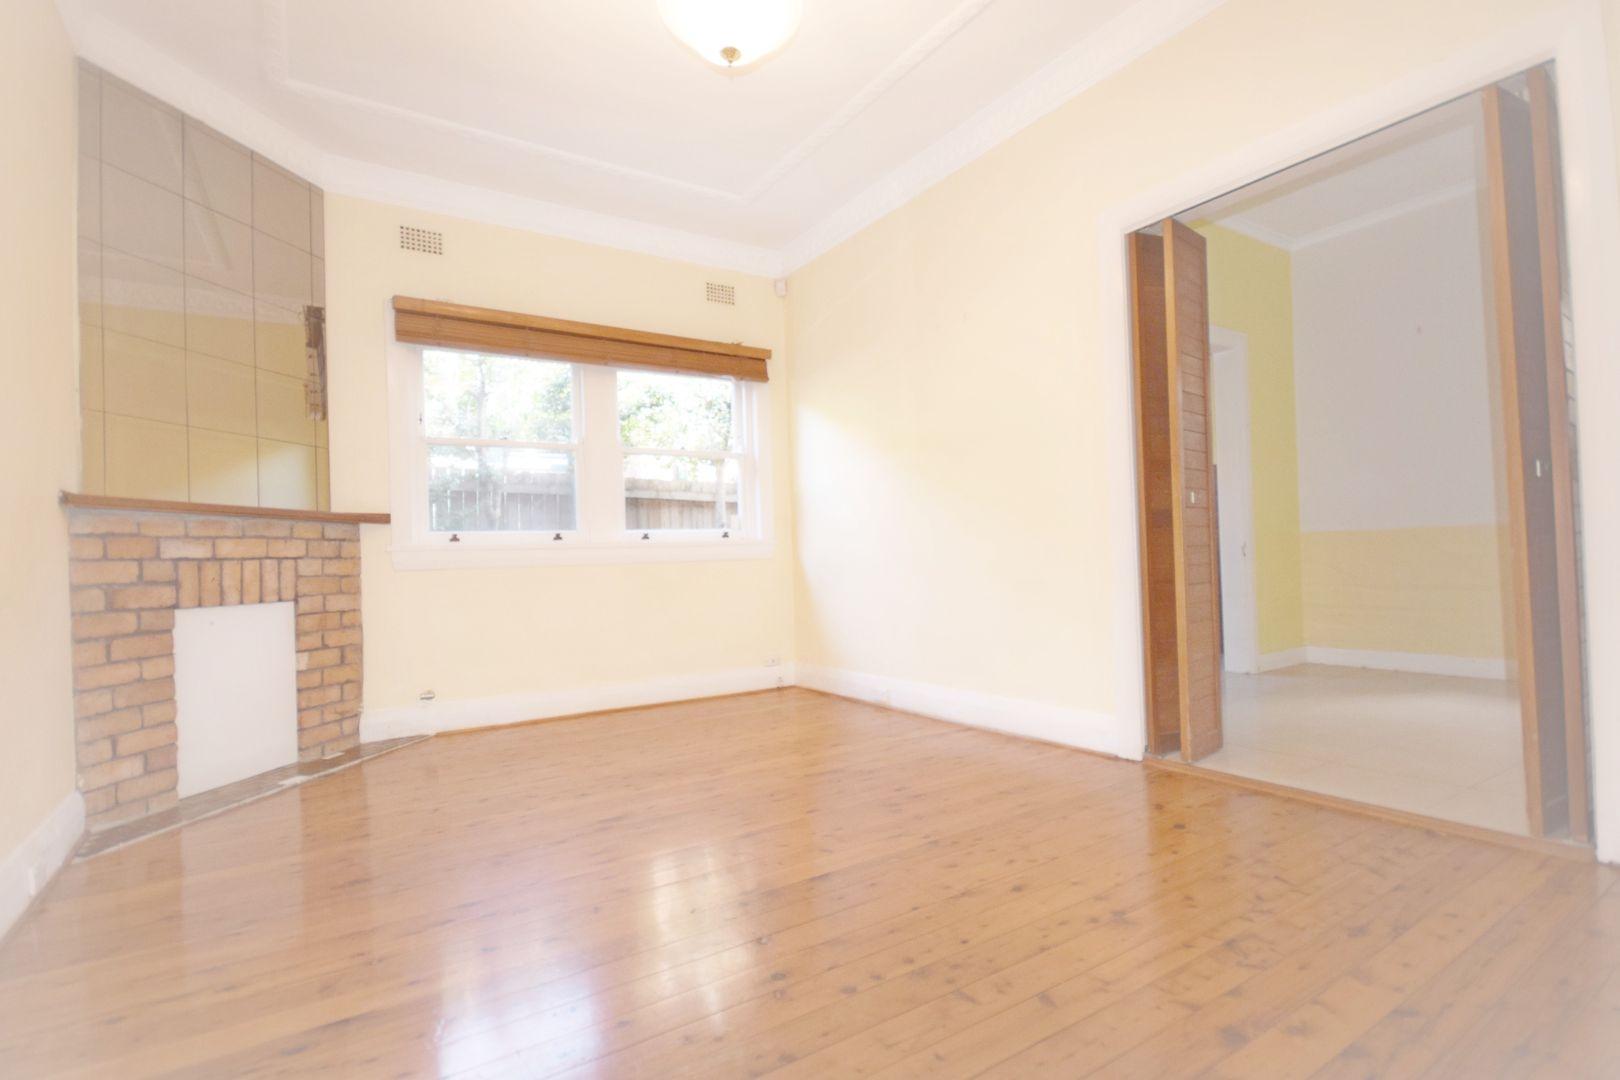 22 Crick  Street, Chatswood NSW 2067, Image 1